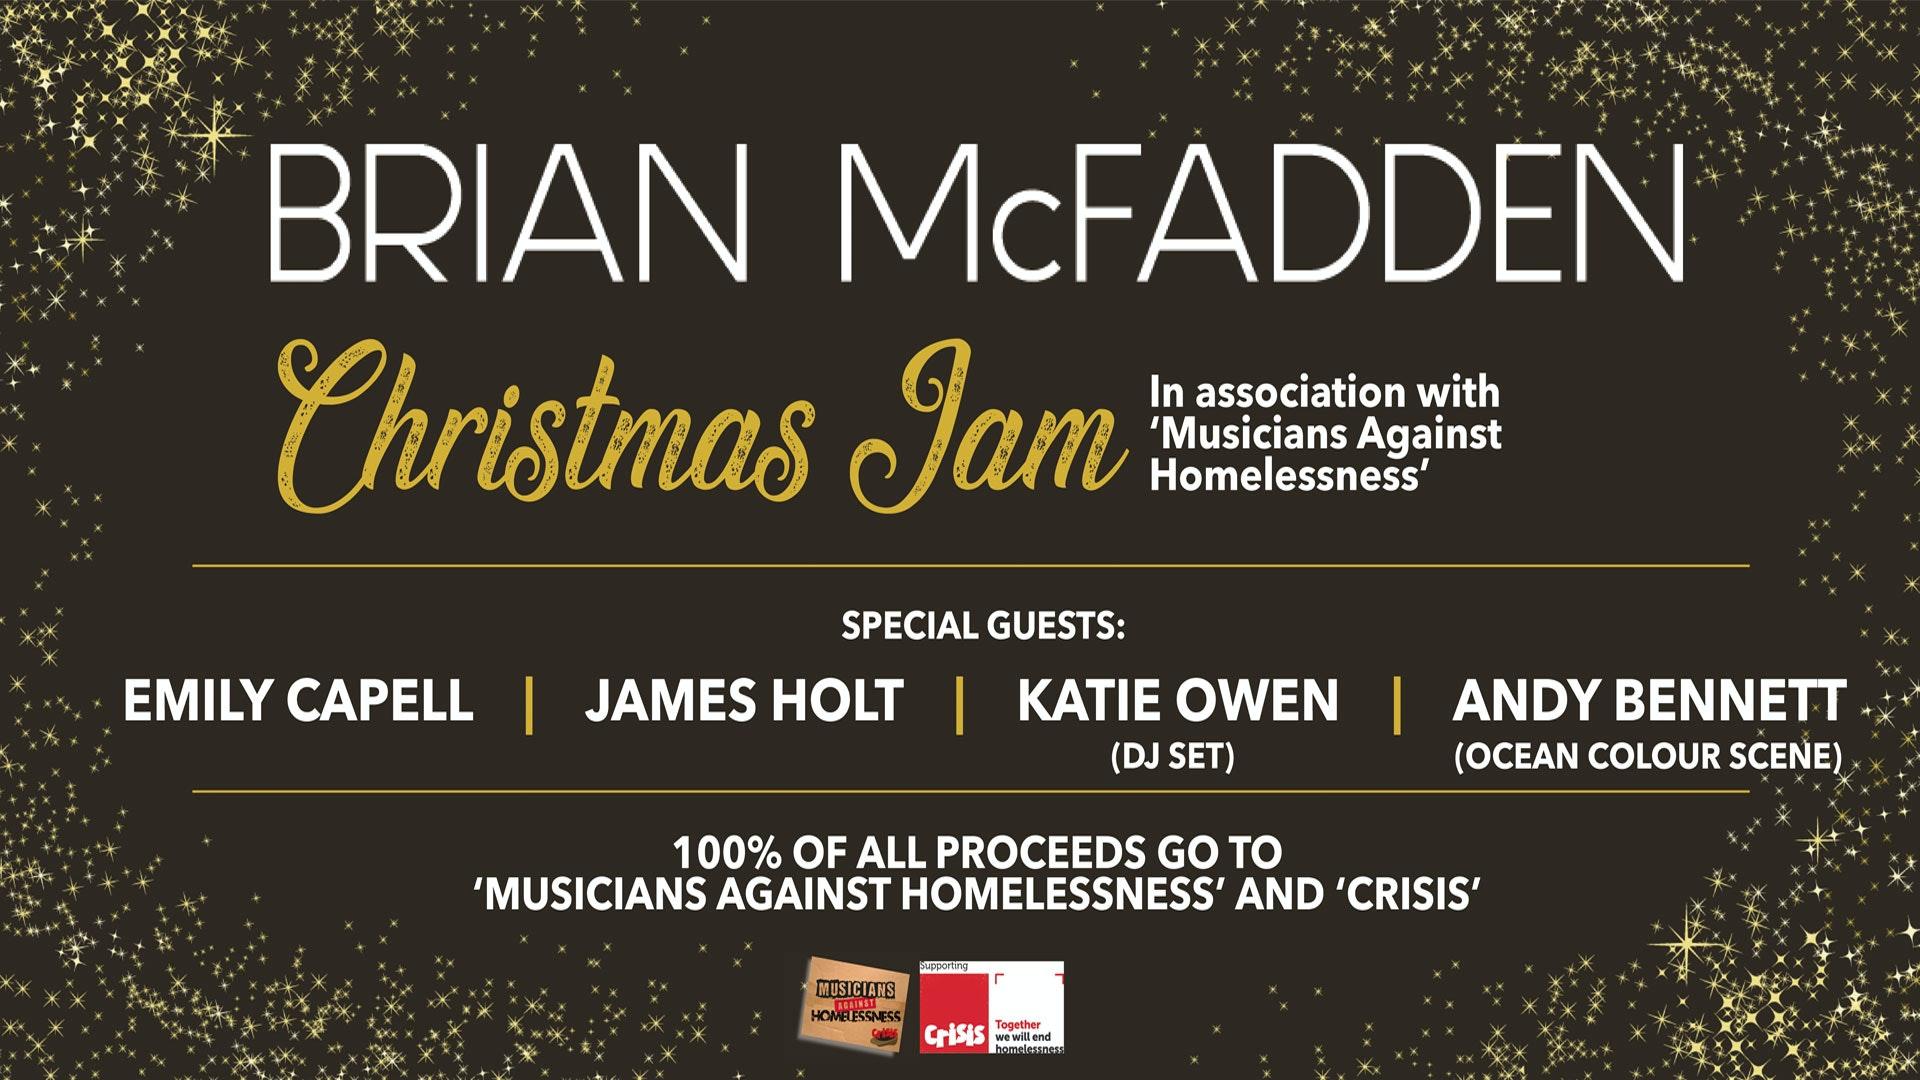 Brian McFadden's Christmas Jam